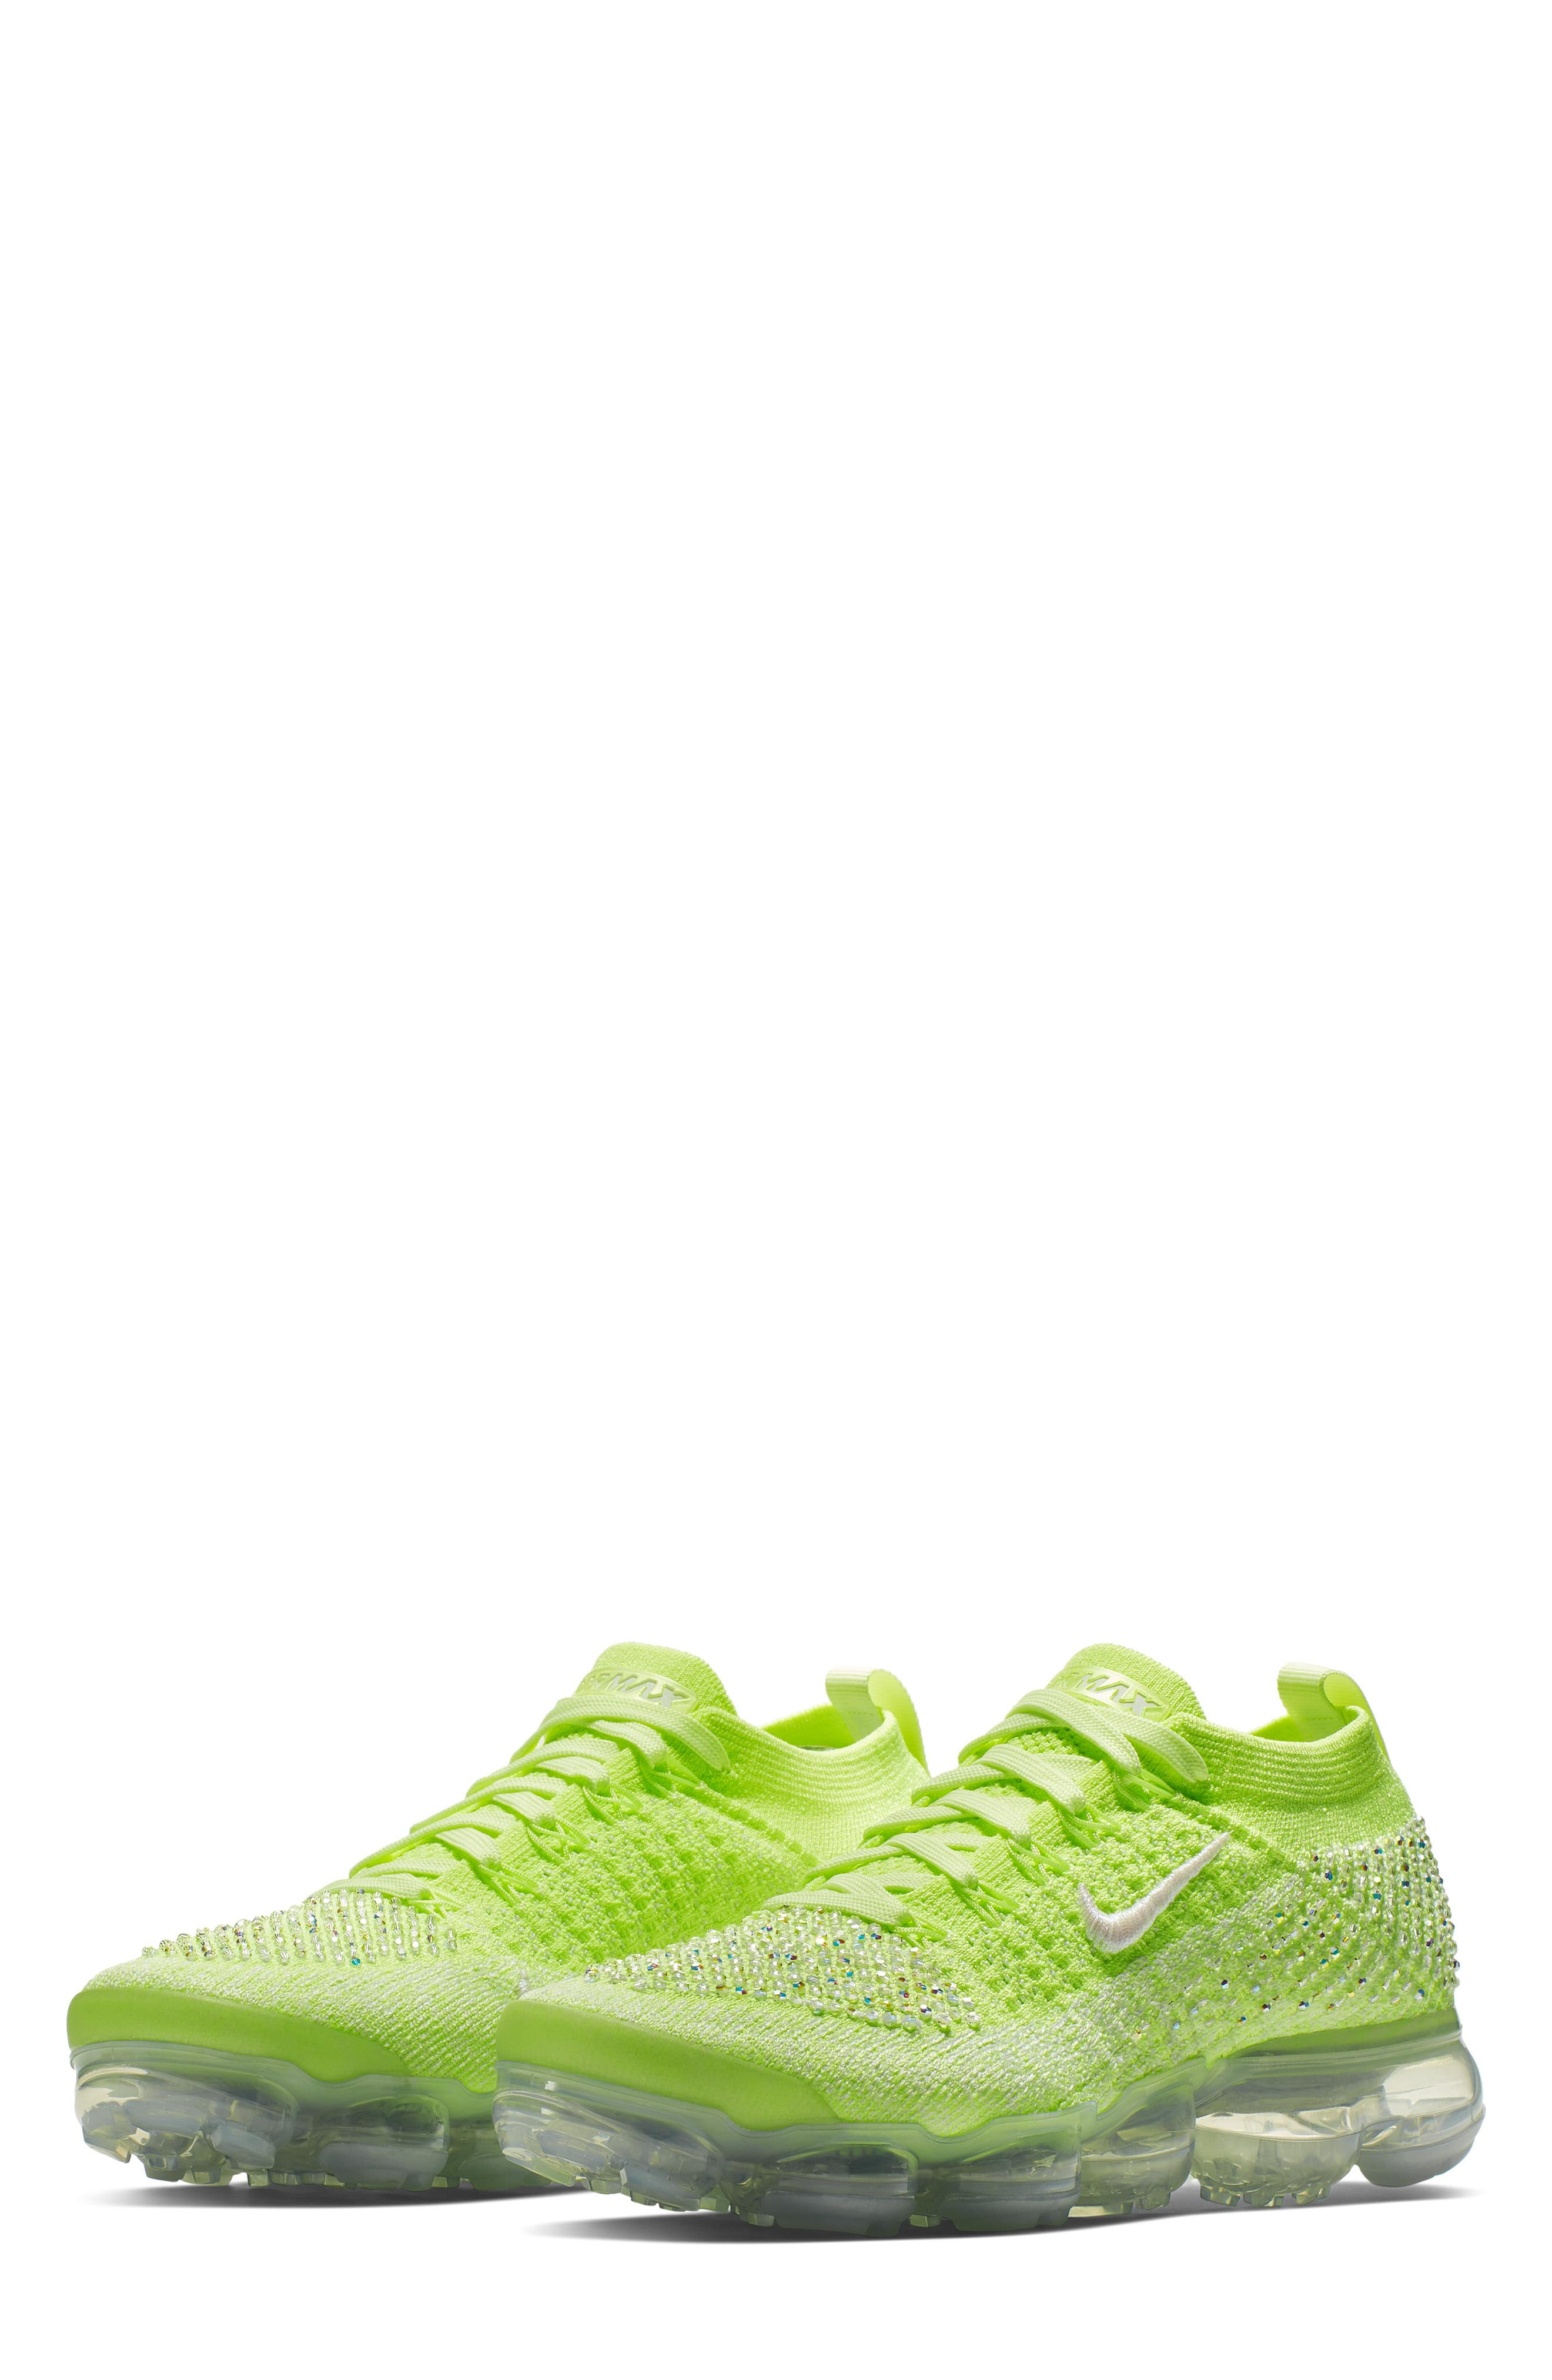 6d8be3606f2 Lyst - Nike Air Vapormax Flyknit 2 Swarovski Running Shoe in Green